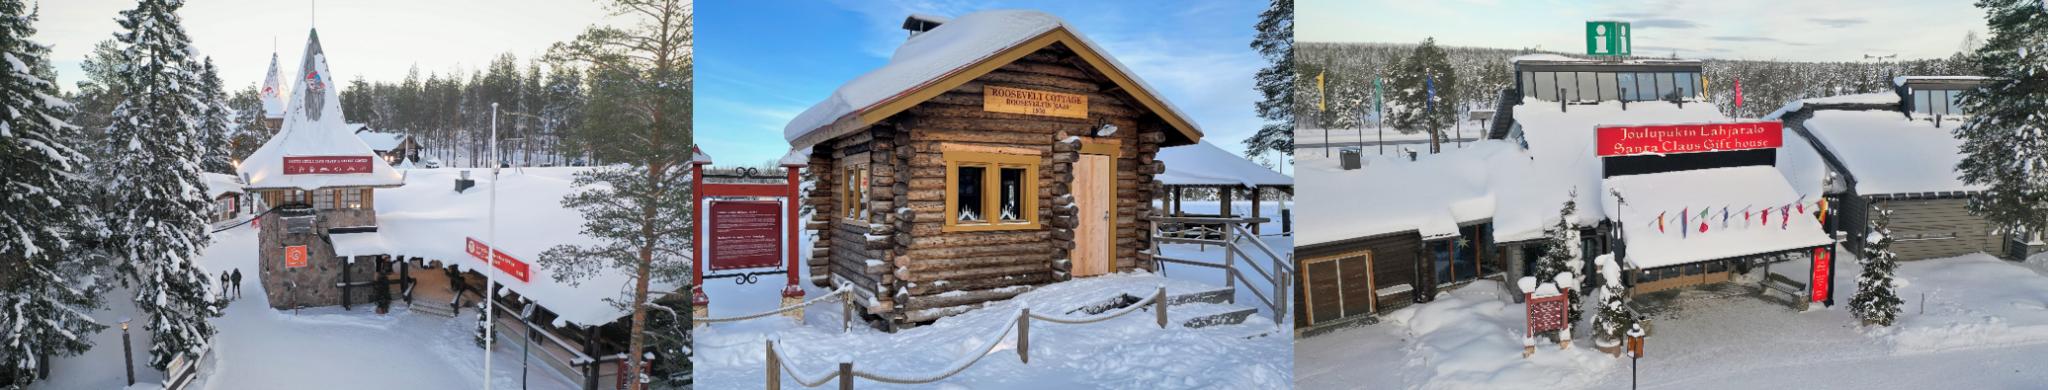 Joulupukin Pajakyla Santa Claus Village attractions